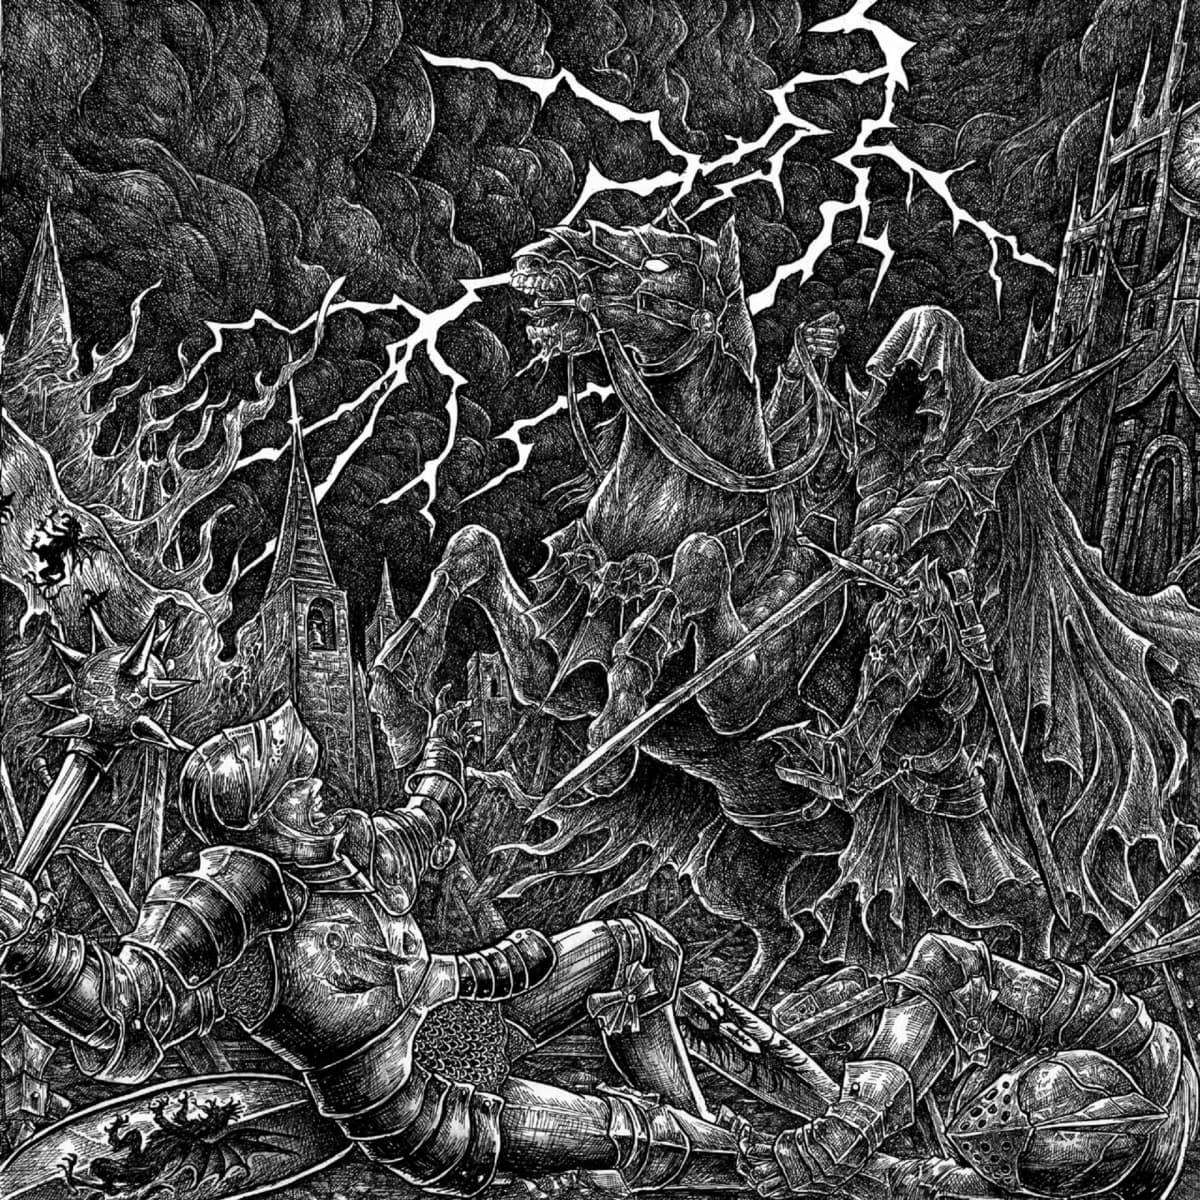 Jenglot Hitam, black metal, Abyssal Rites